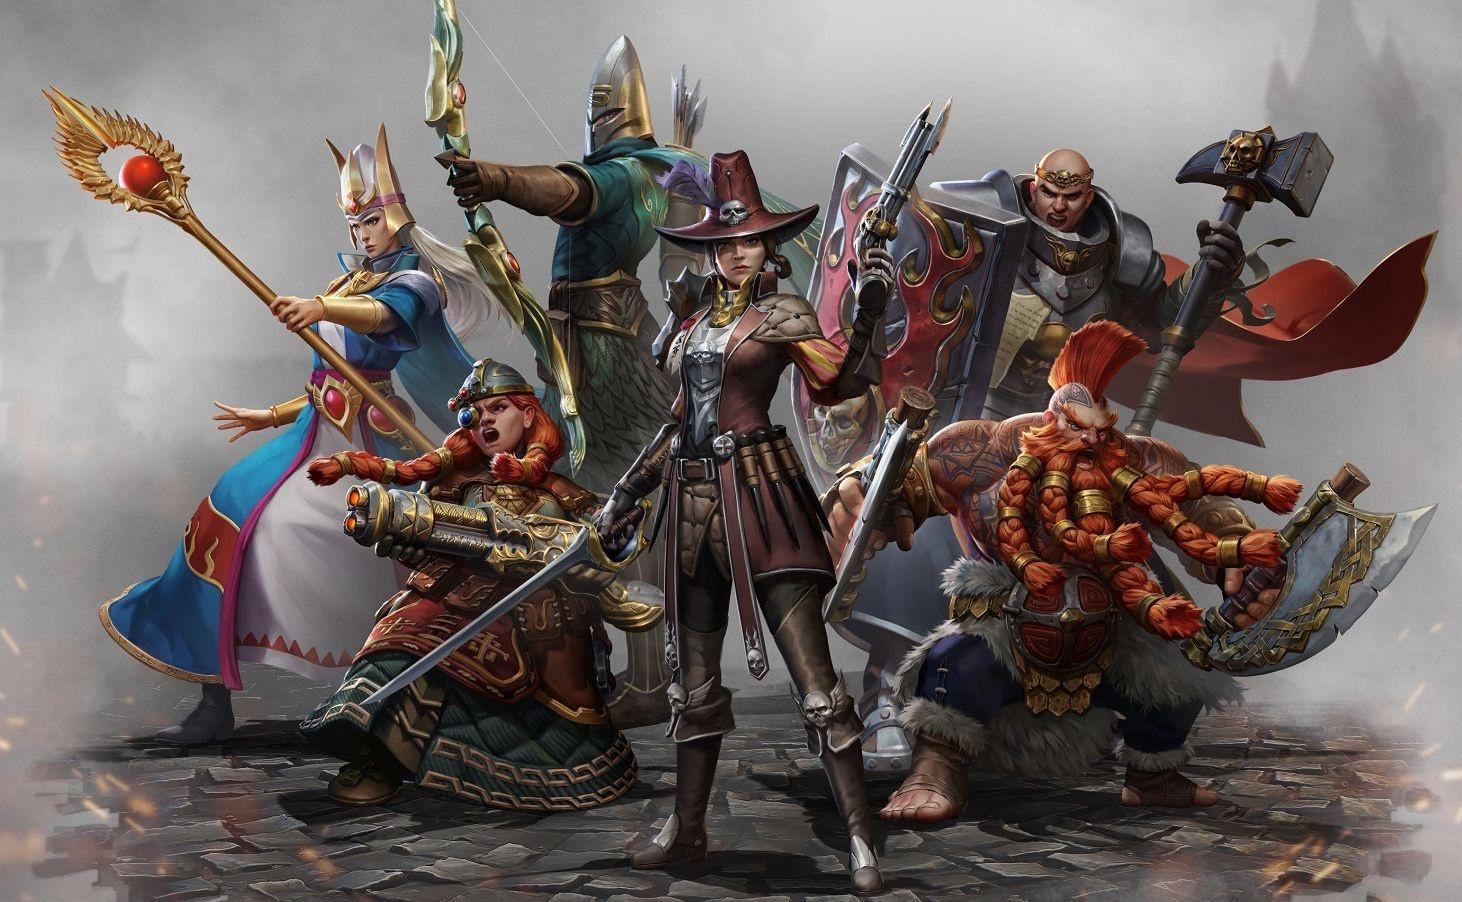 Авторы онлайновой ролёвки Warhammer: Odyssey показали Мариенбург